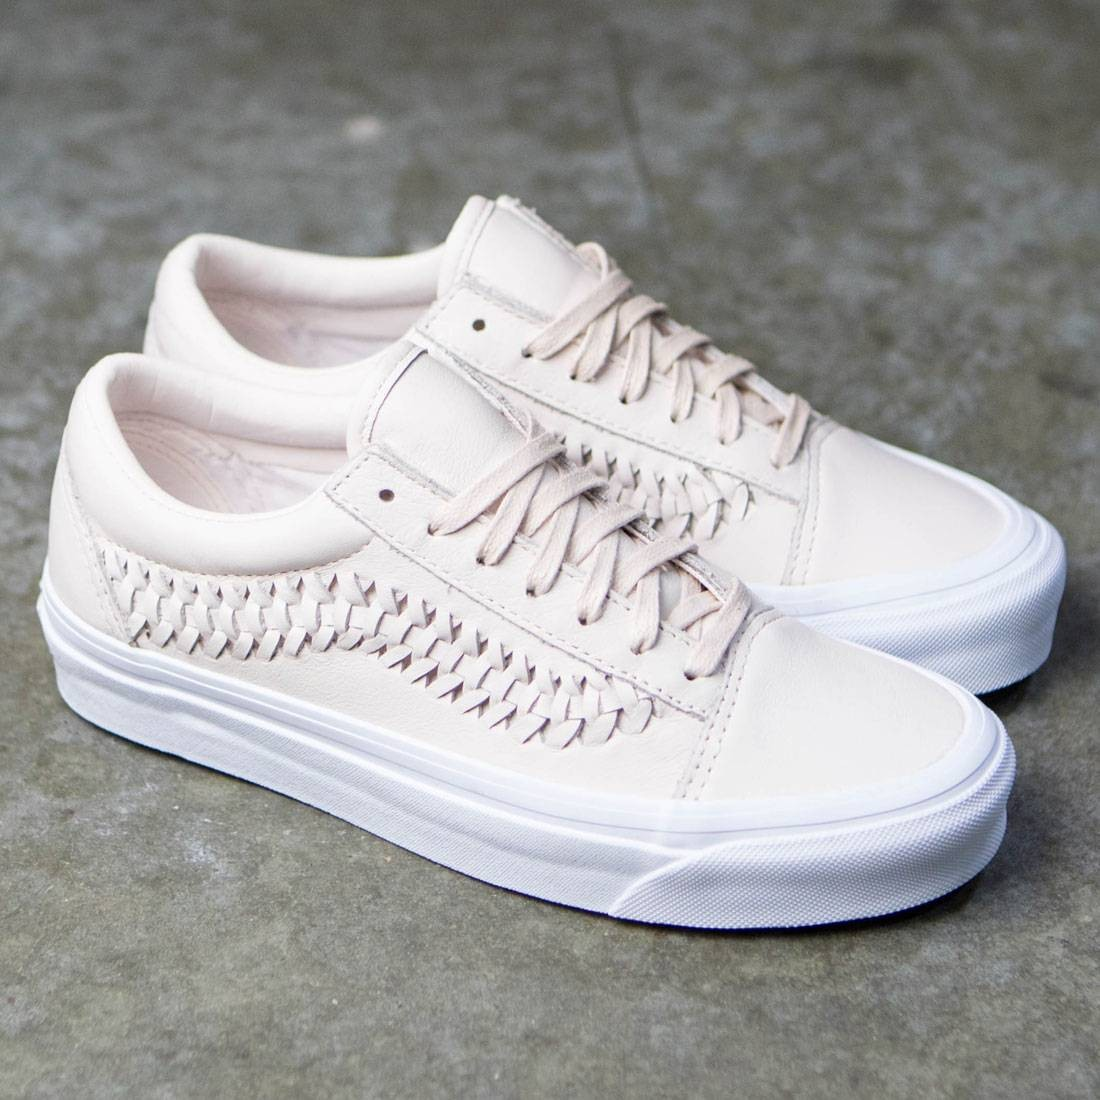 37753bb678 Vans Women Old Skool Weave DX - Leather (delicacy)